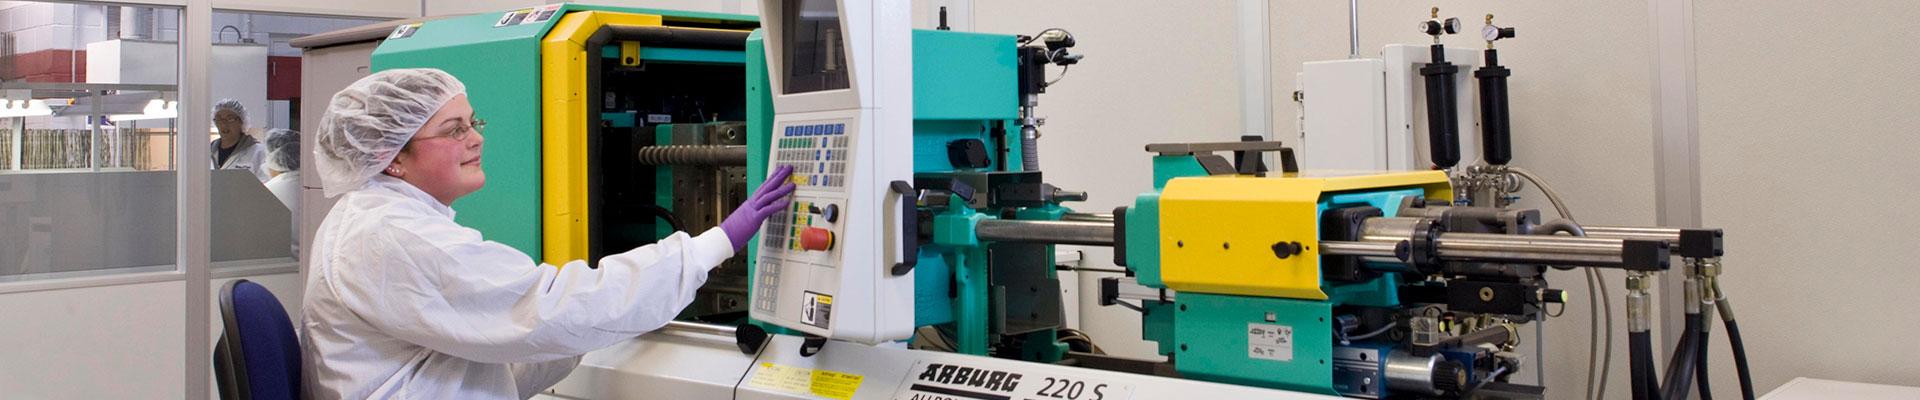 plastics processing technologies